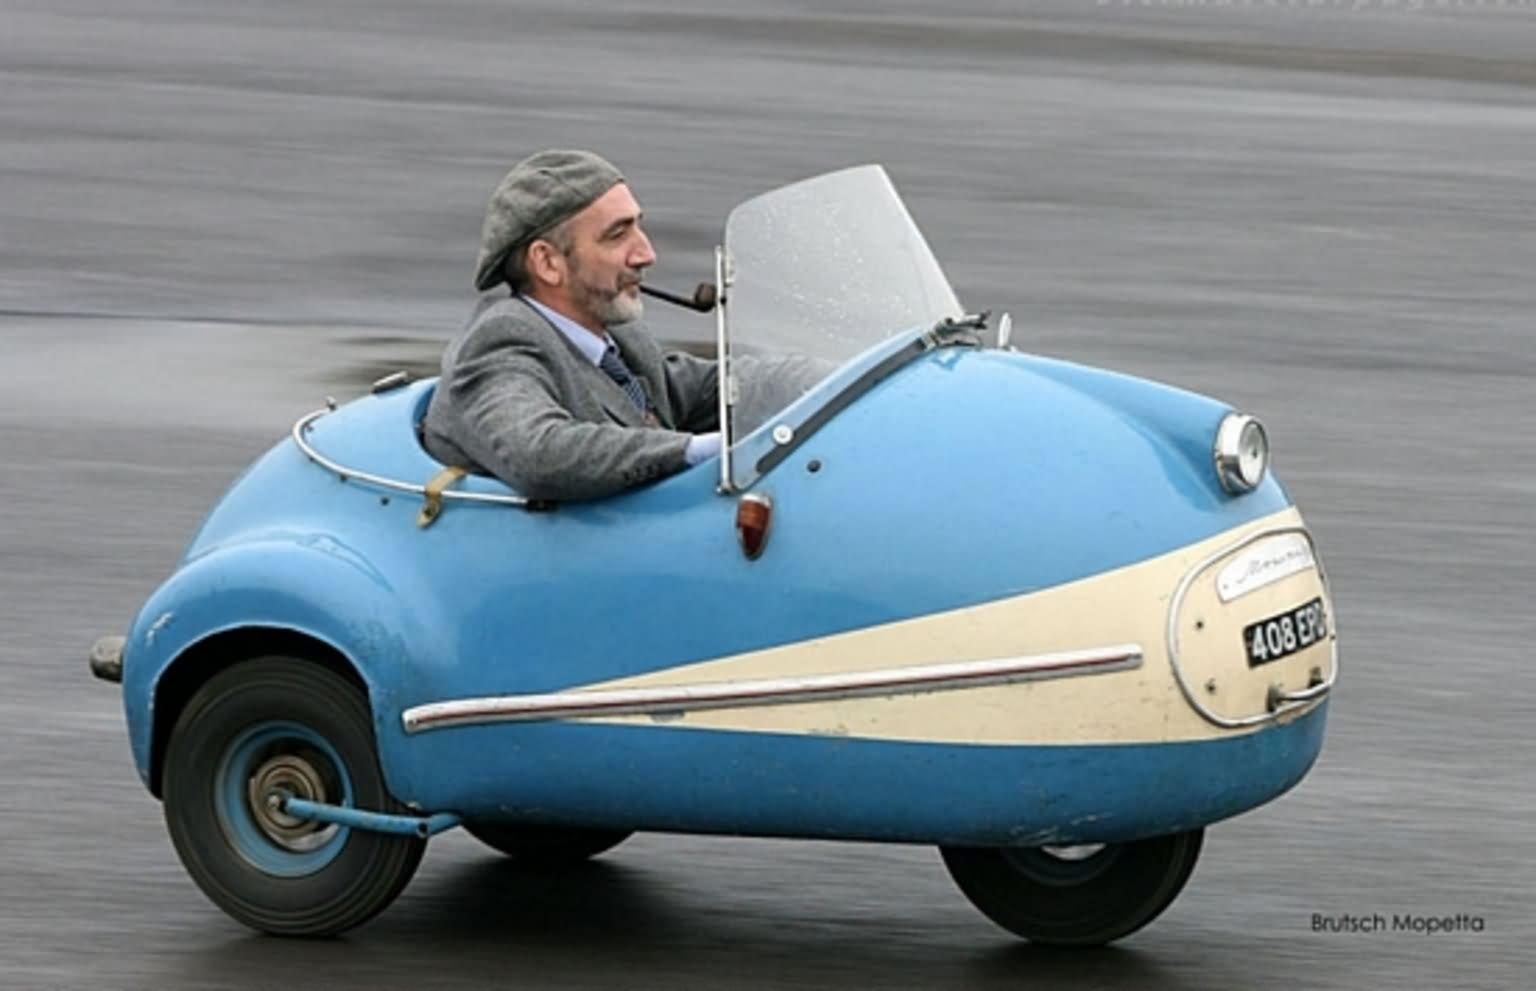 Three Wheels Funny Looking Small Car Photo